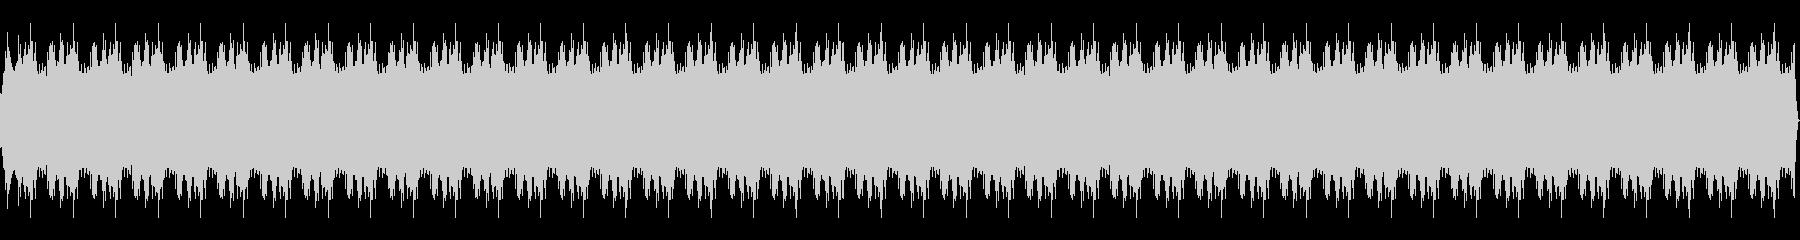 【396Hz】を想定のヒーリング曲です。の未再生の波形